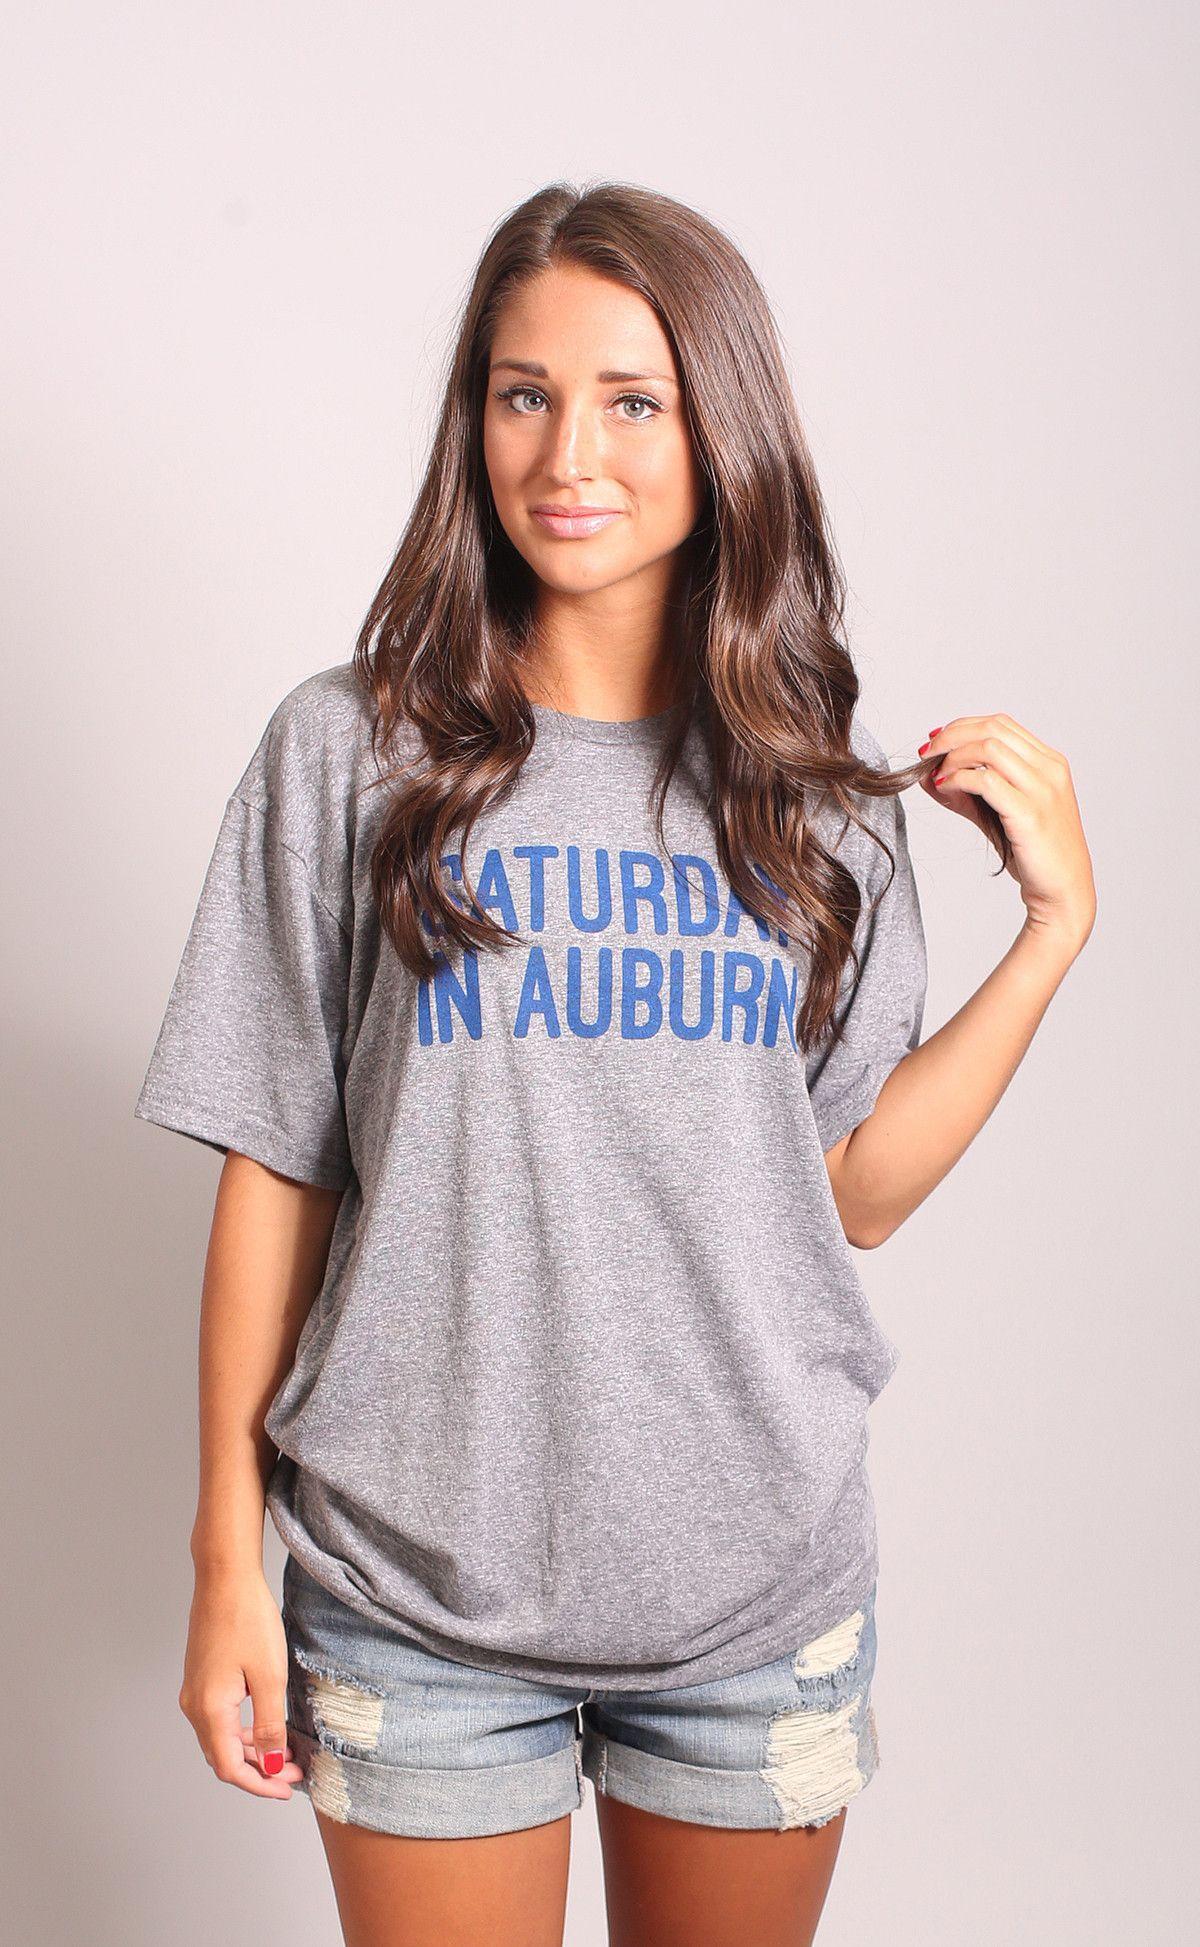 1098acff charlie southern: saturday in auburn t shirt | GAMEDAY | Auburn t ...